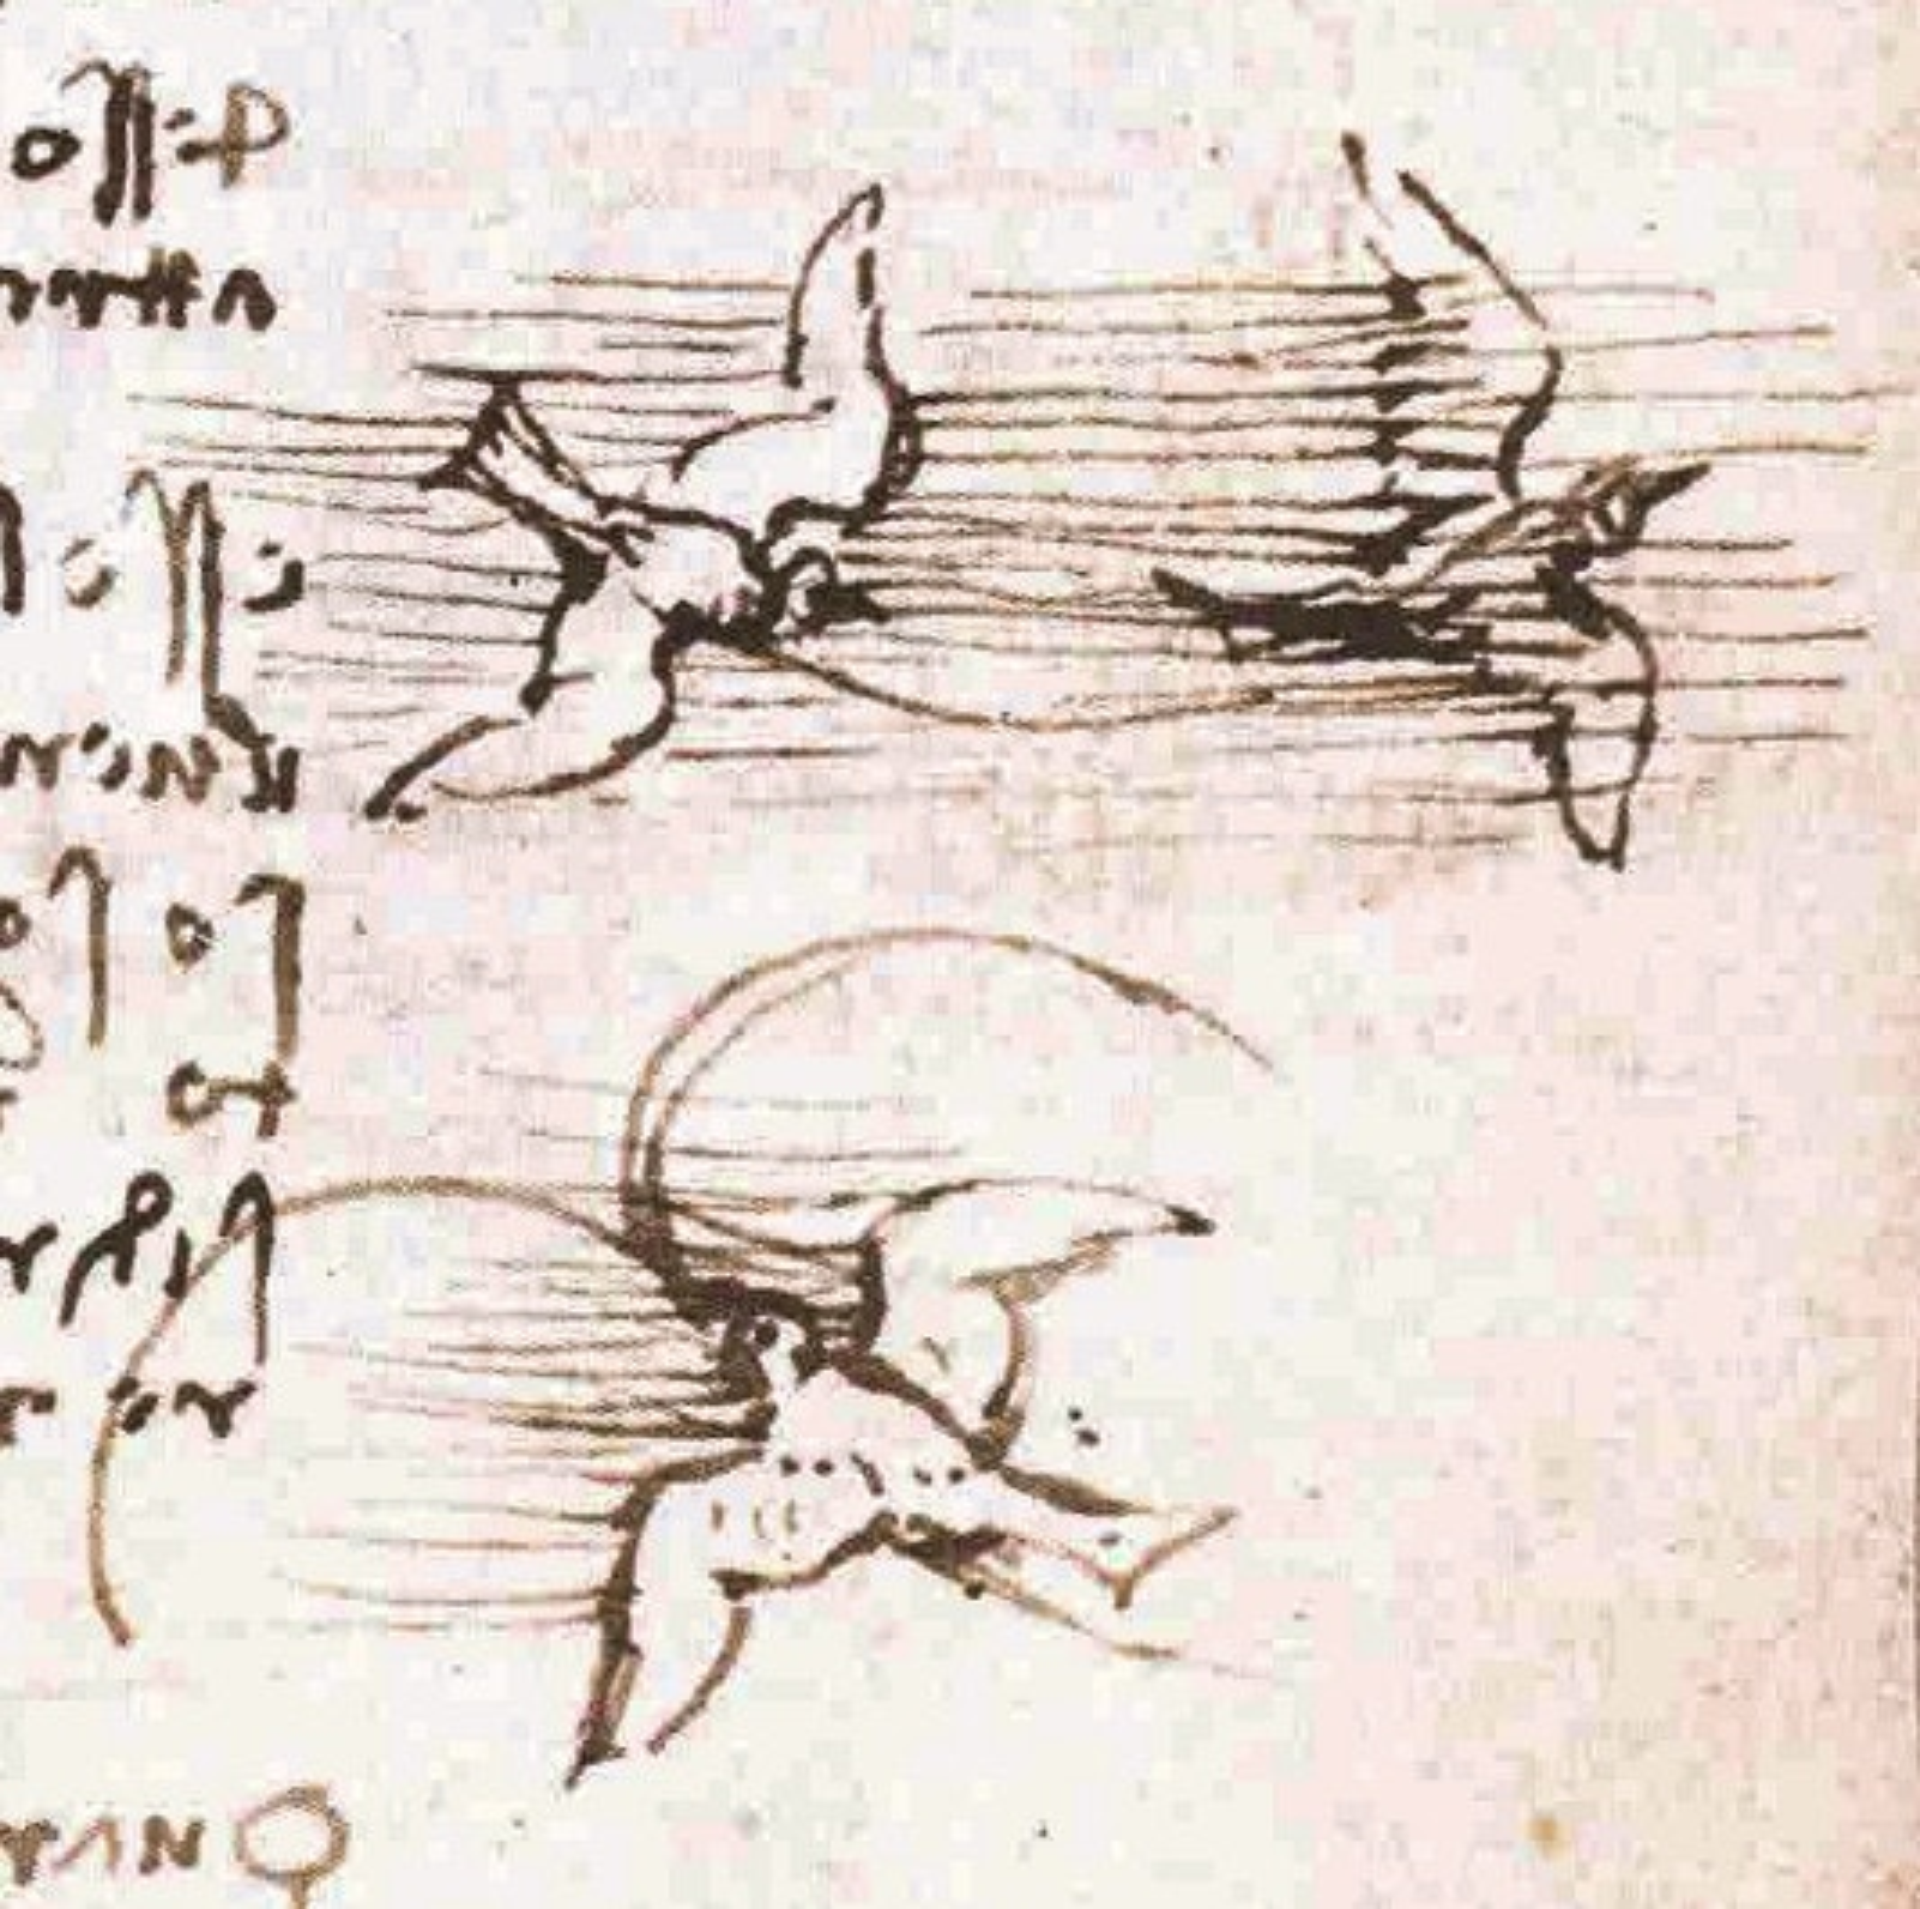 Leonardo da Vinci saw in animals the 'image of the world'